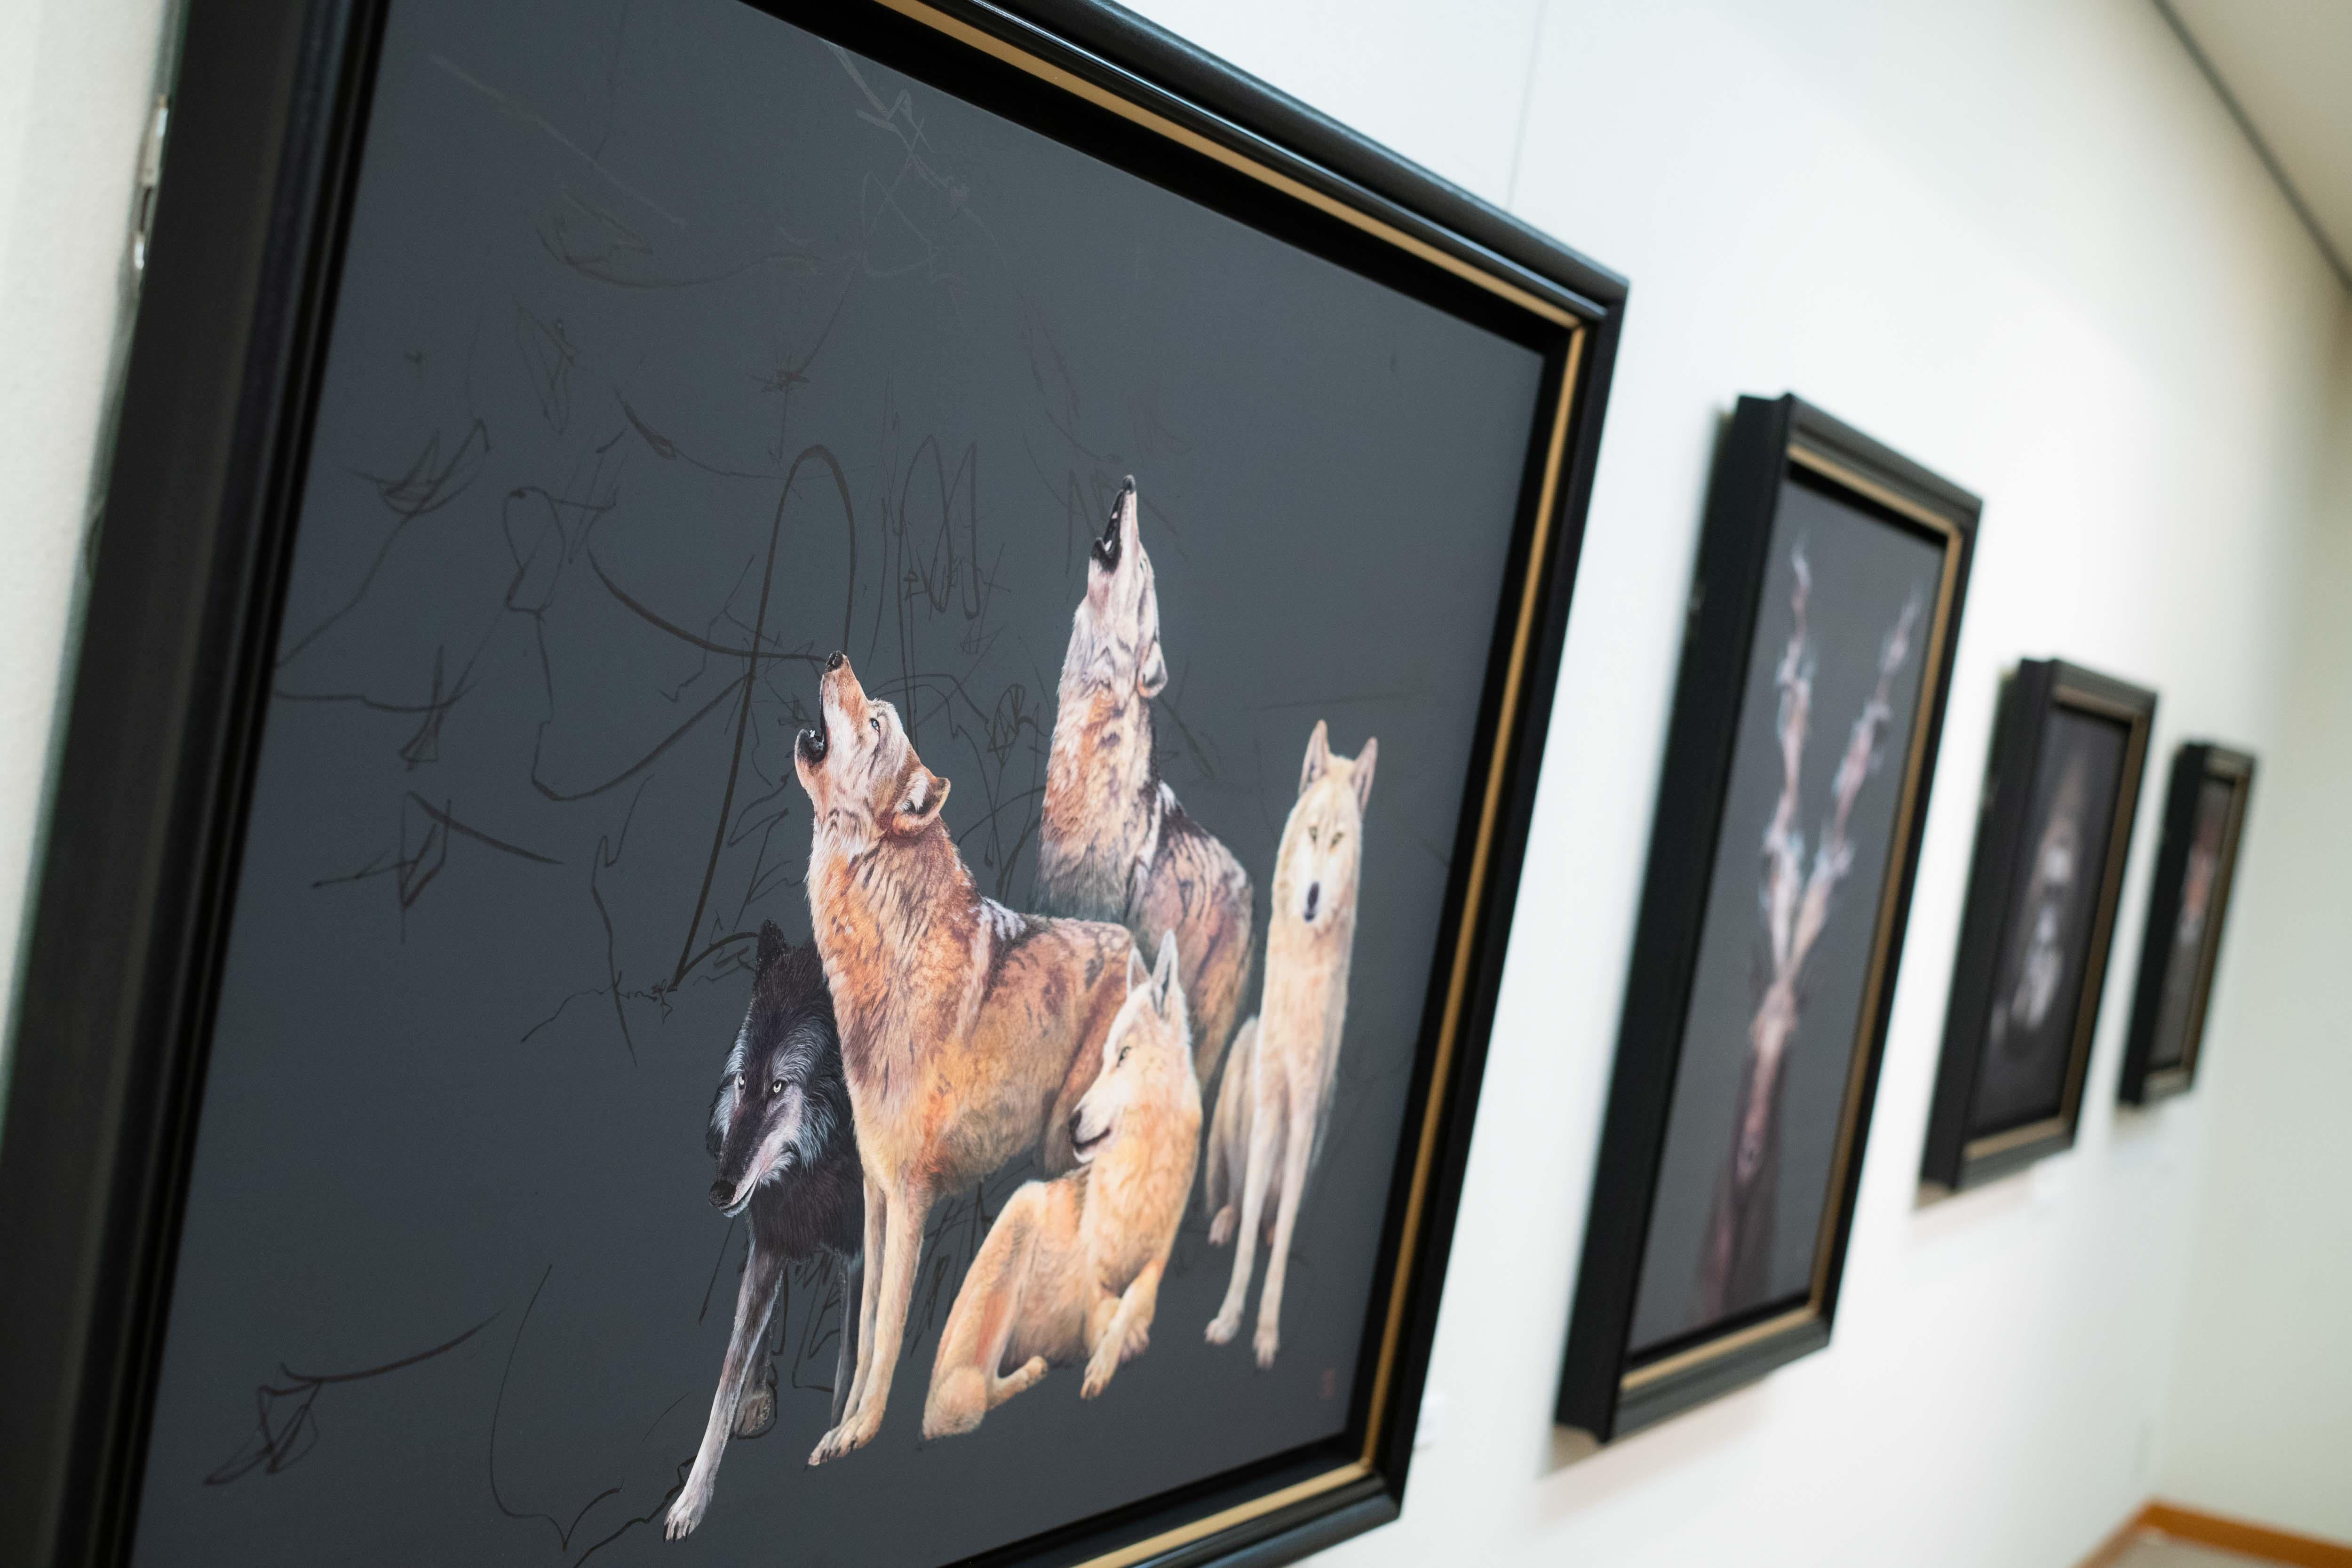 https://kanakokinutani.com/exhibition/image/S20201007-060.jpg